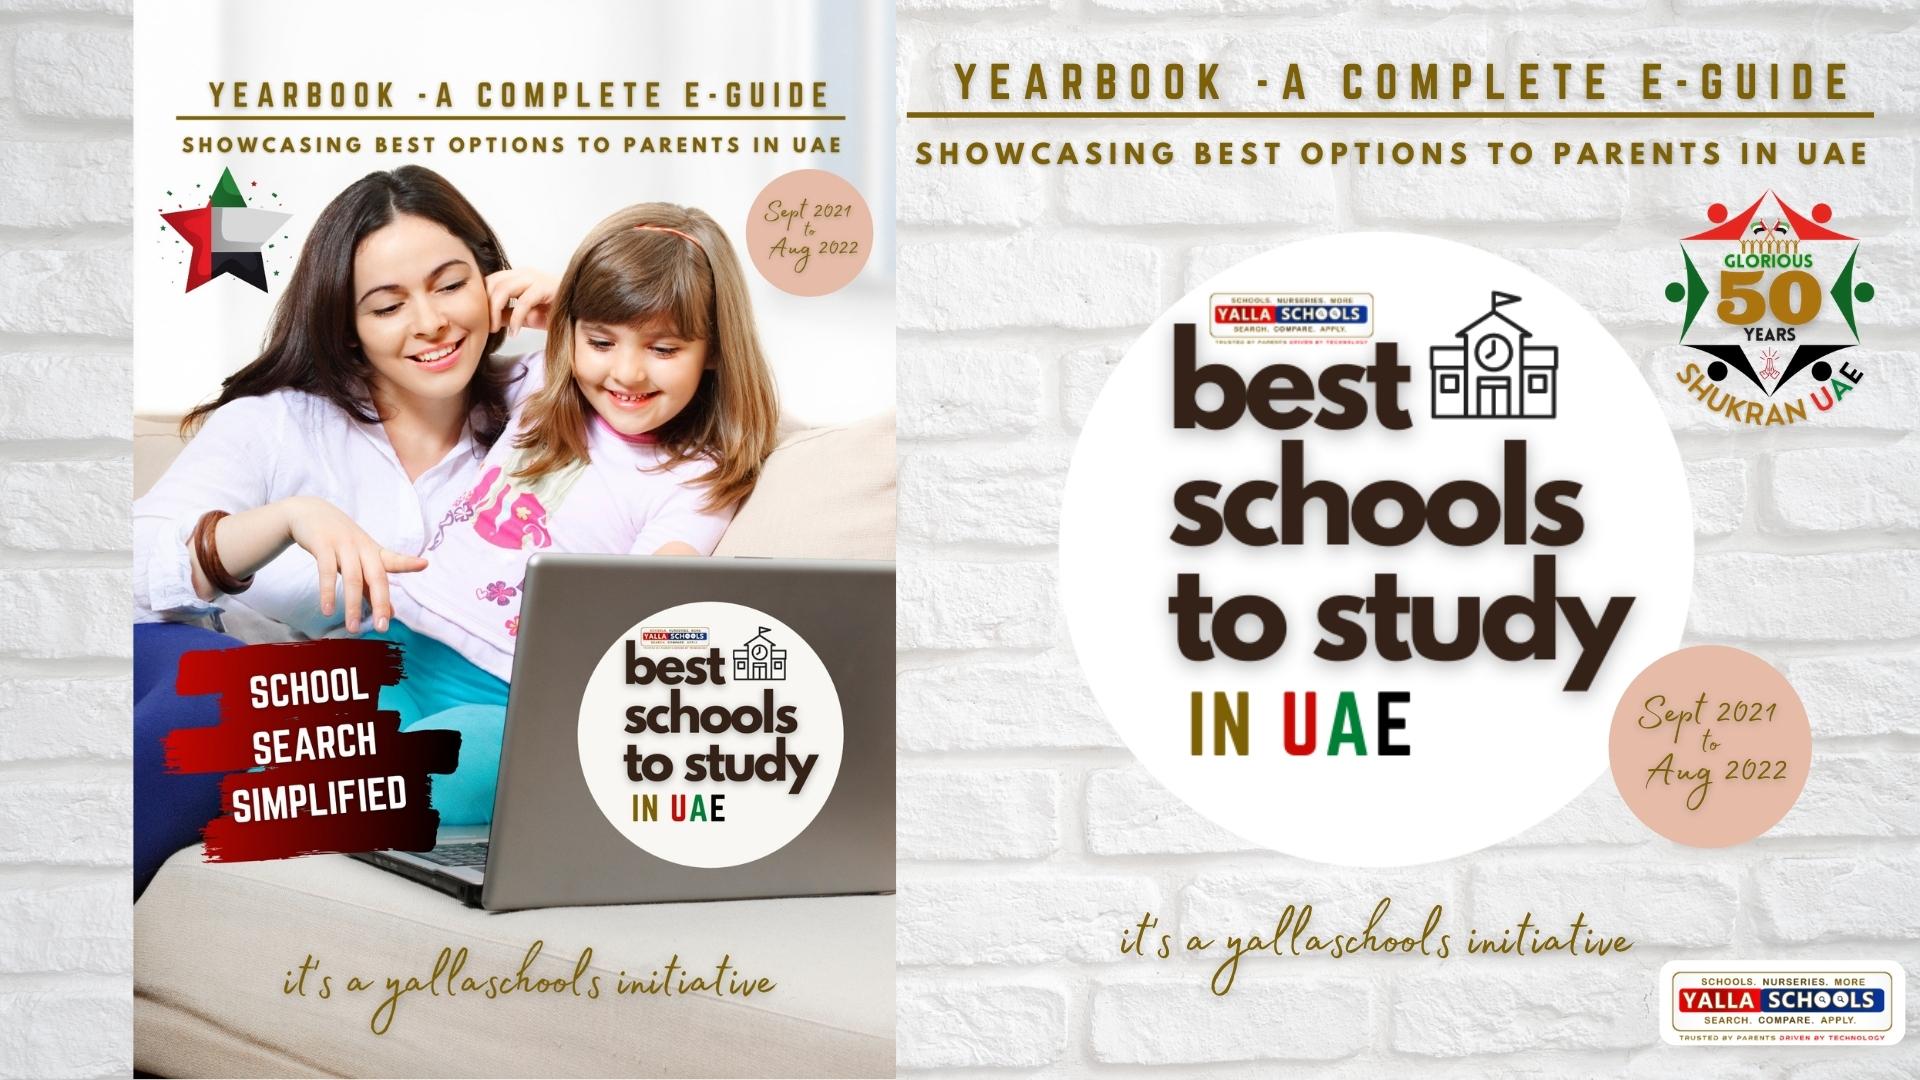 Best_Schools_To_Study_in_UAE_Yearbook_-_Banner